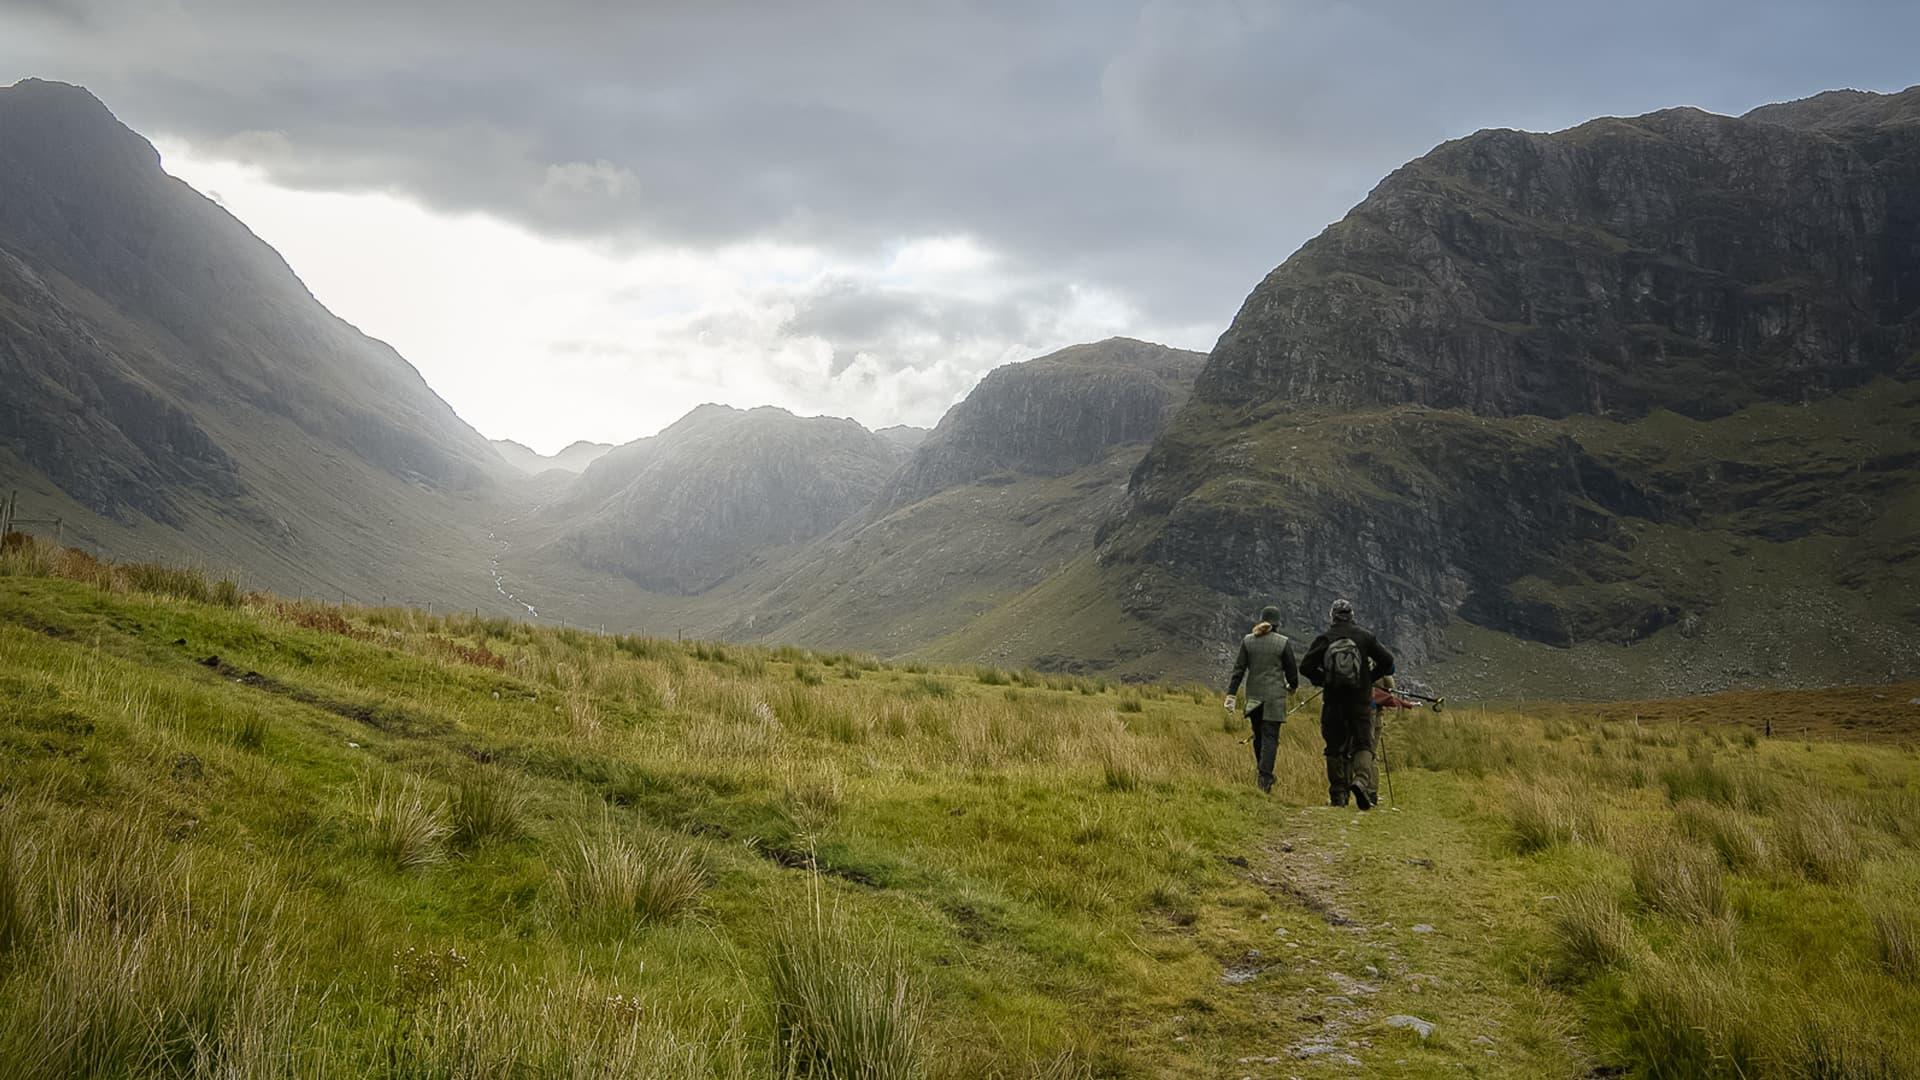 Walking & hiking in Scotland